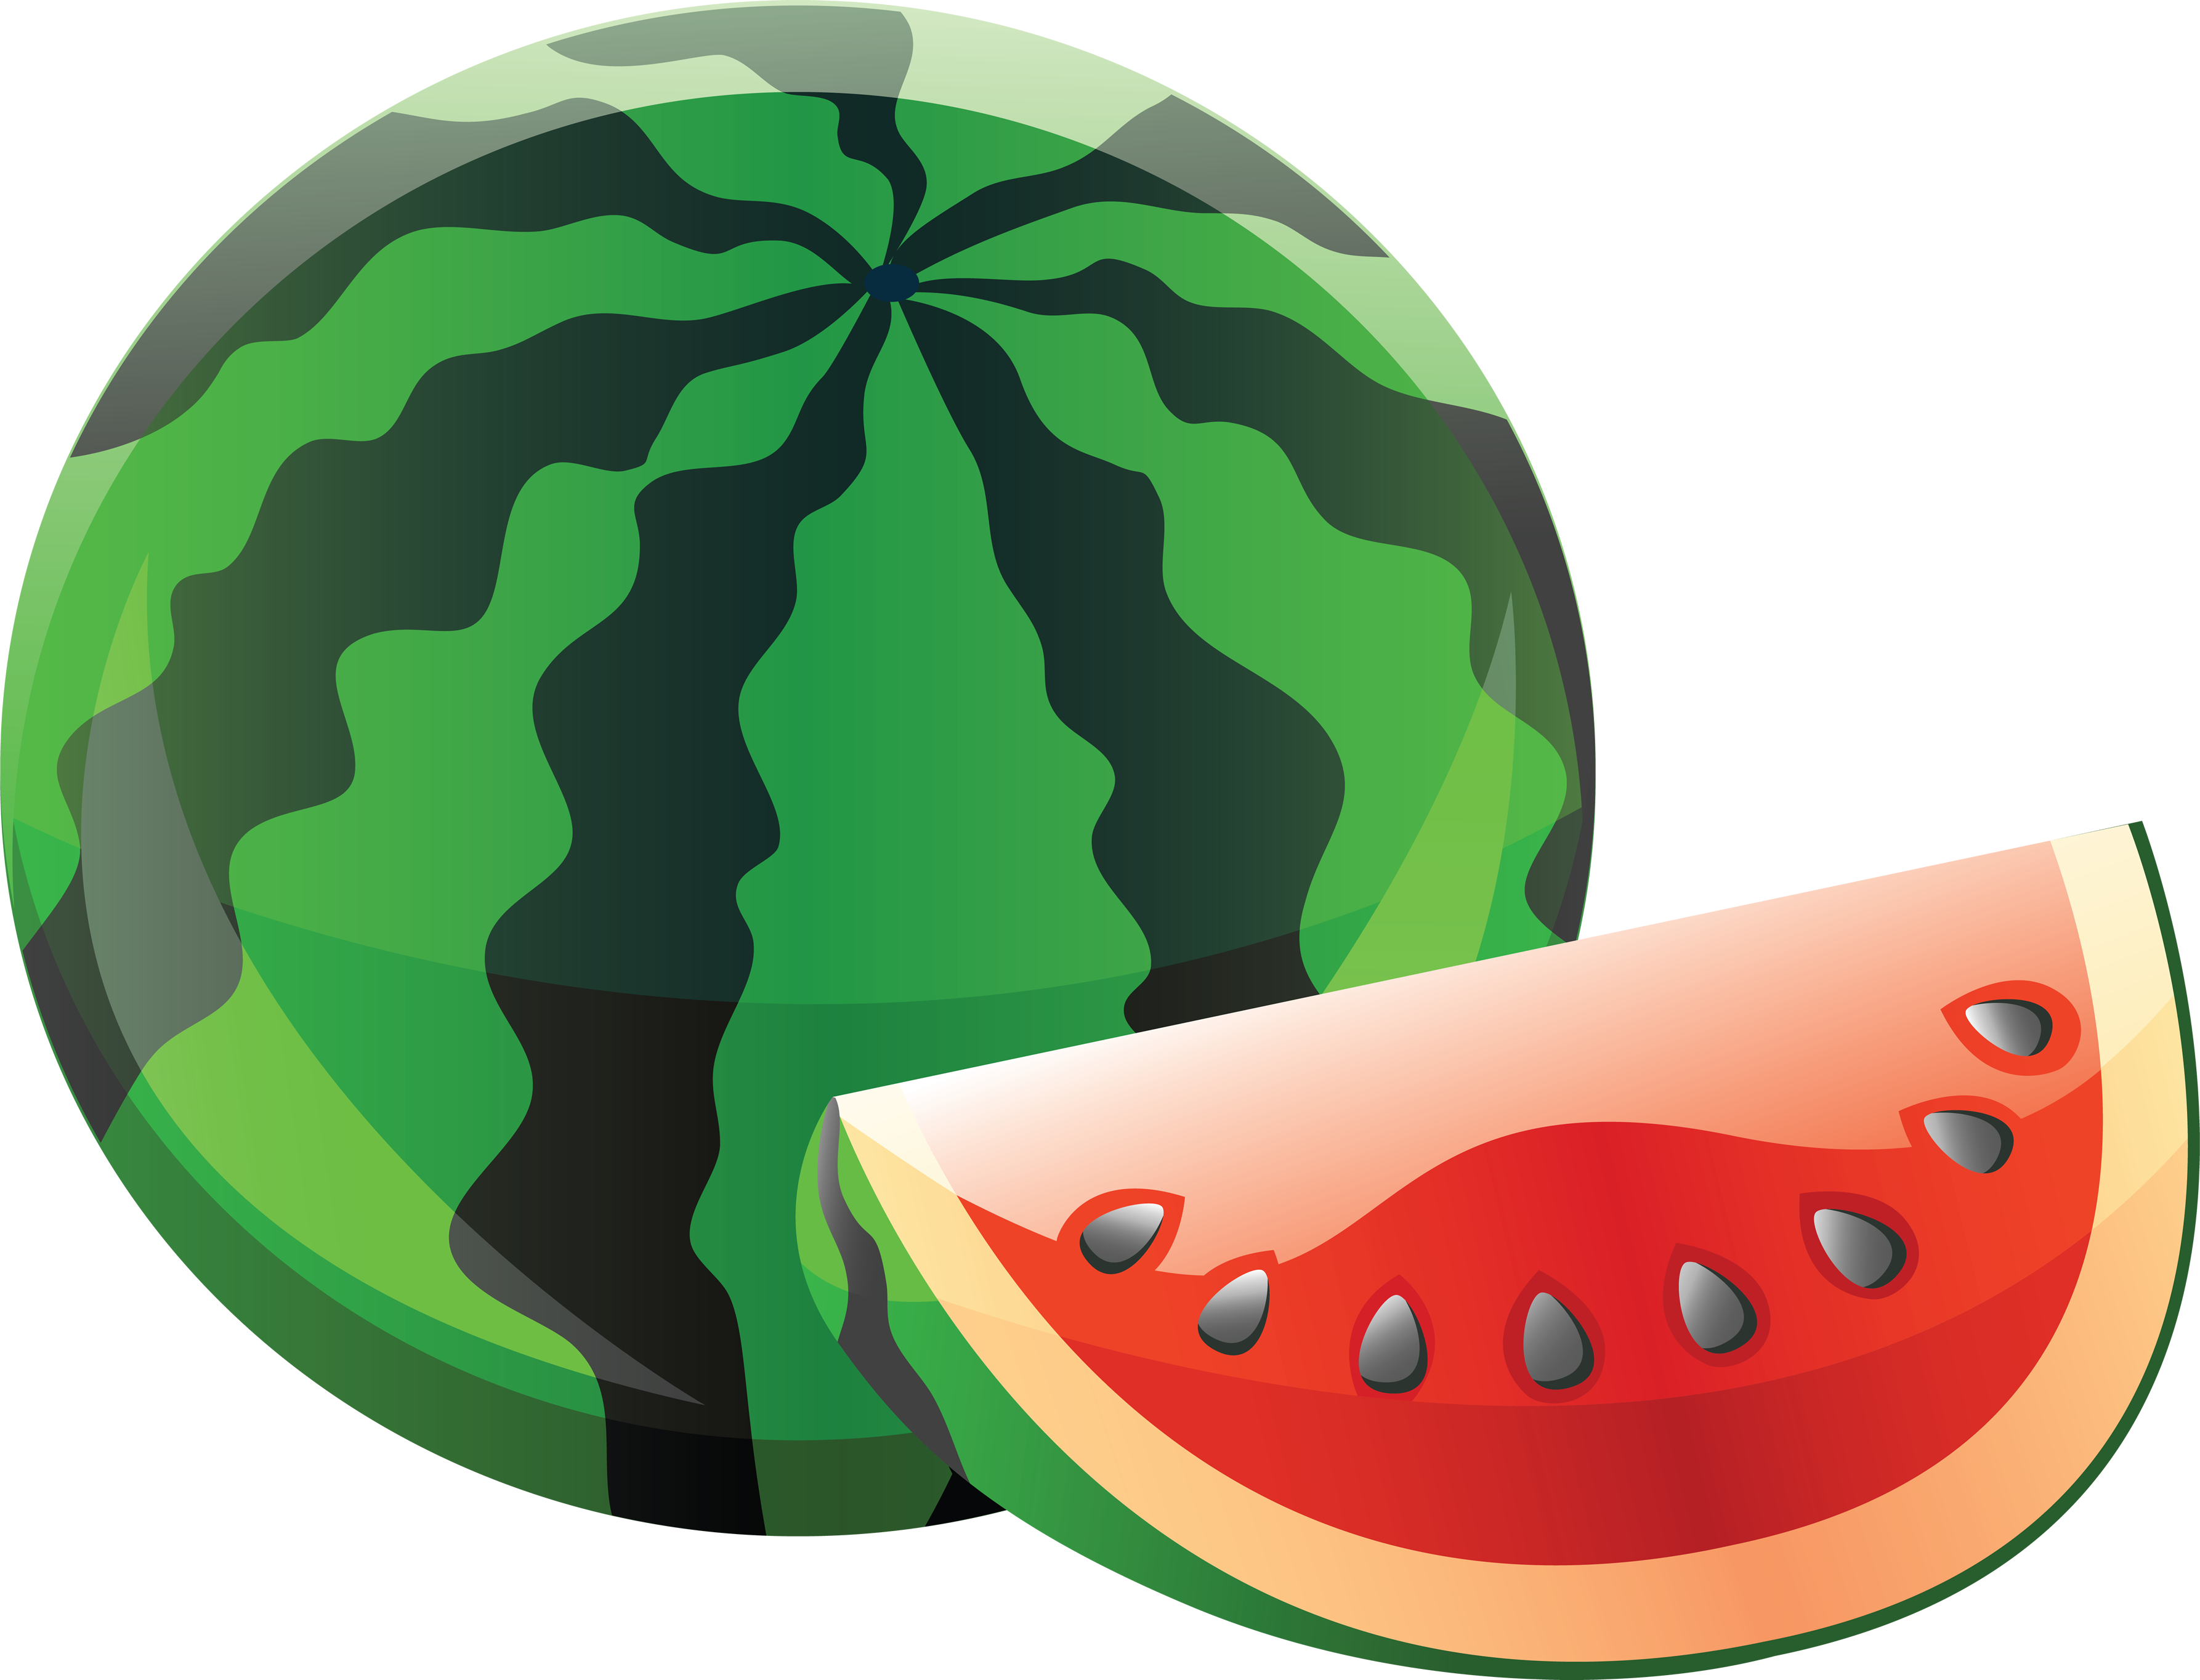 Watermelon Png Image Watermelon Png Images Fruit